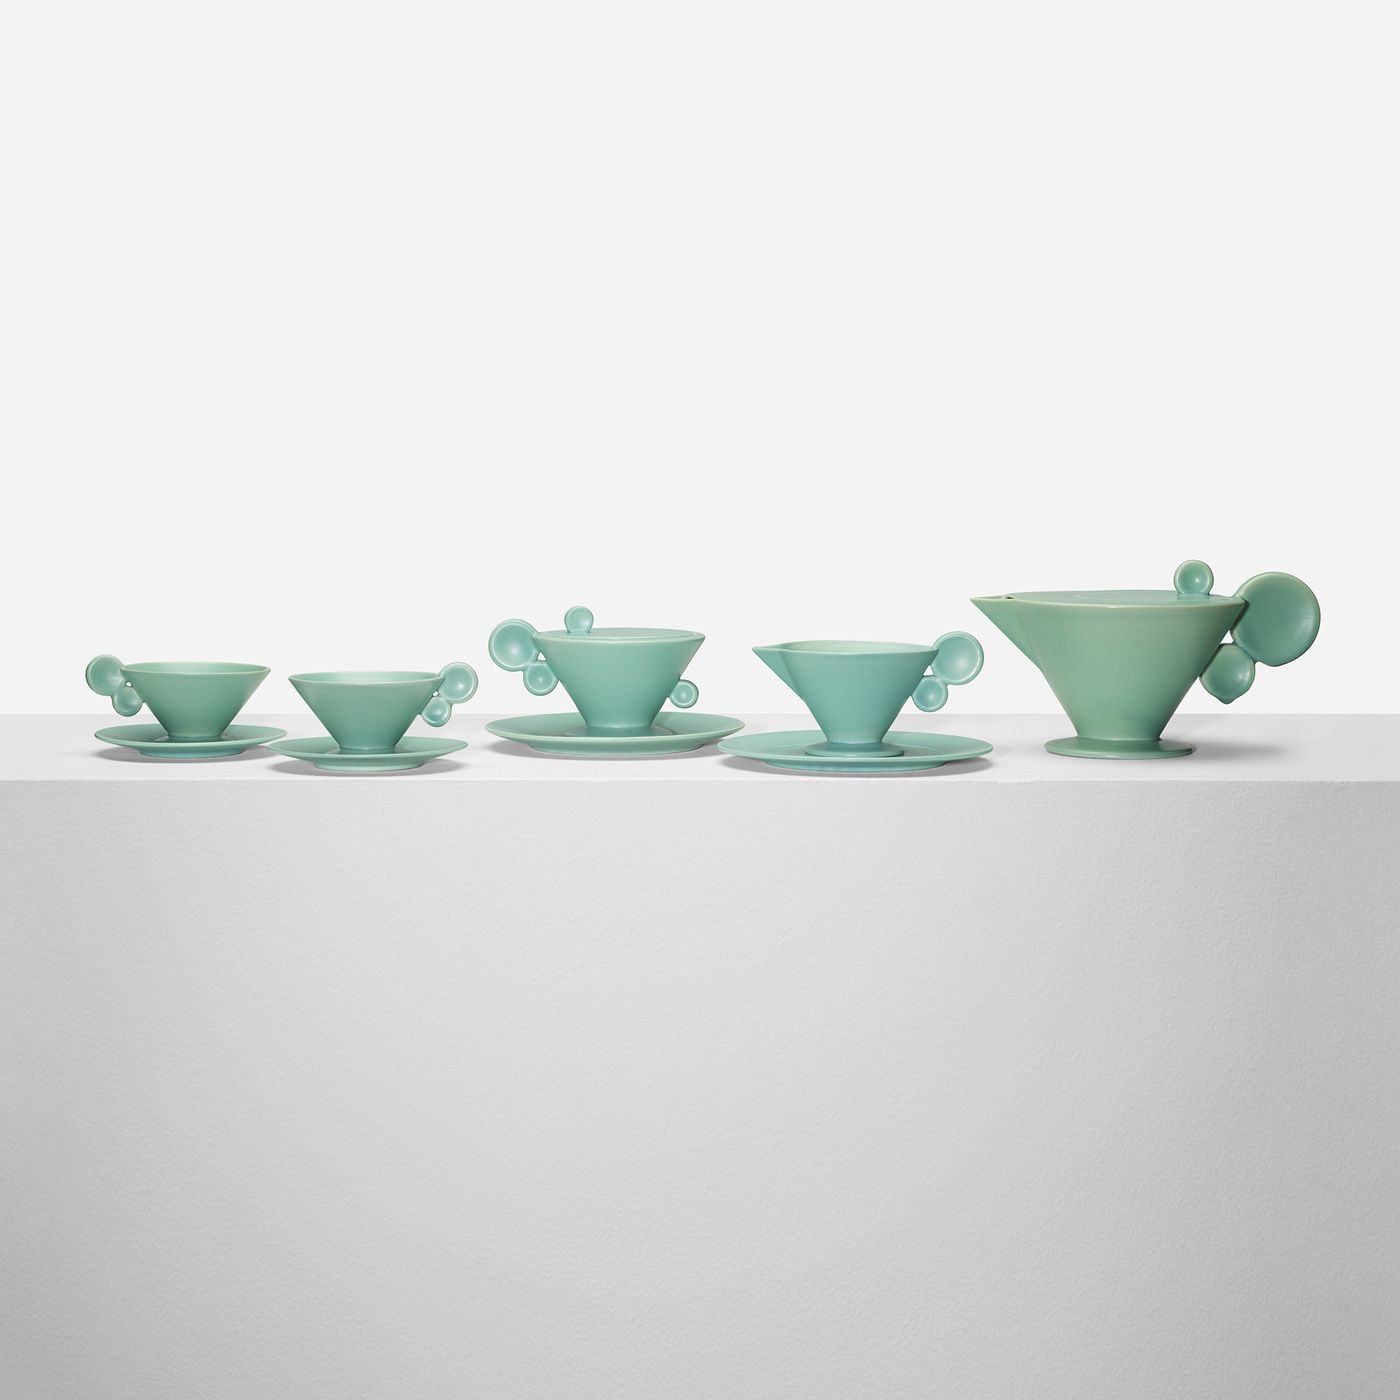 140: Margarete Heymann-Marks / tea service < Important Design, 6 June 2013 < Auctions | Wright